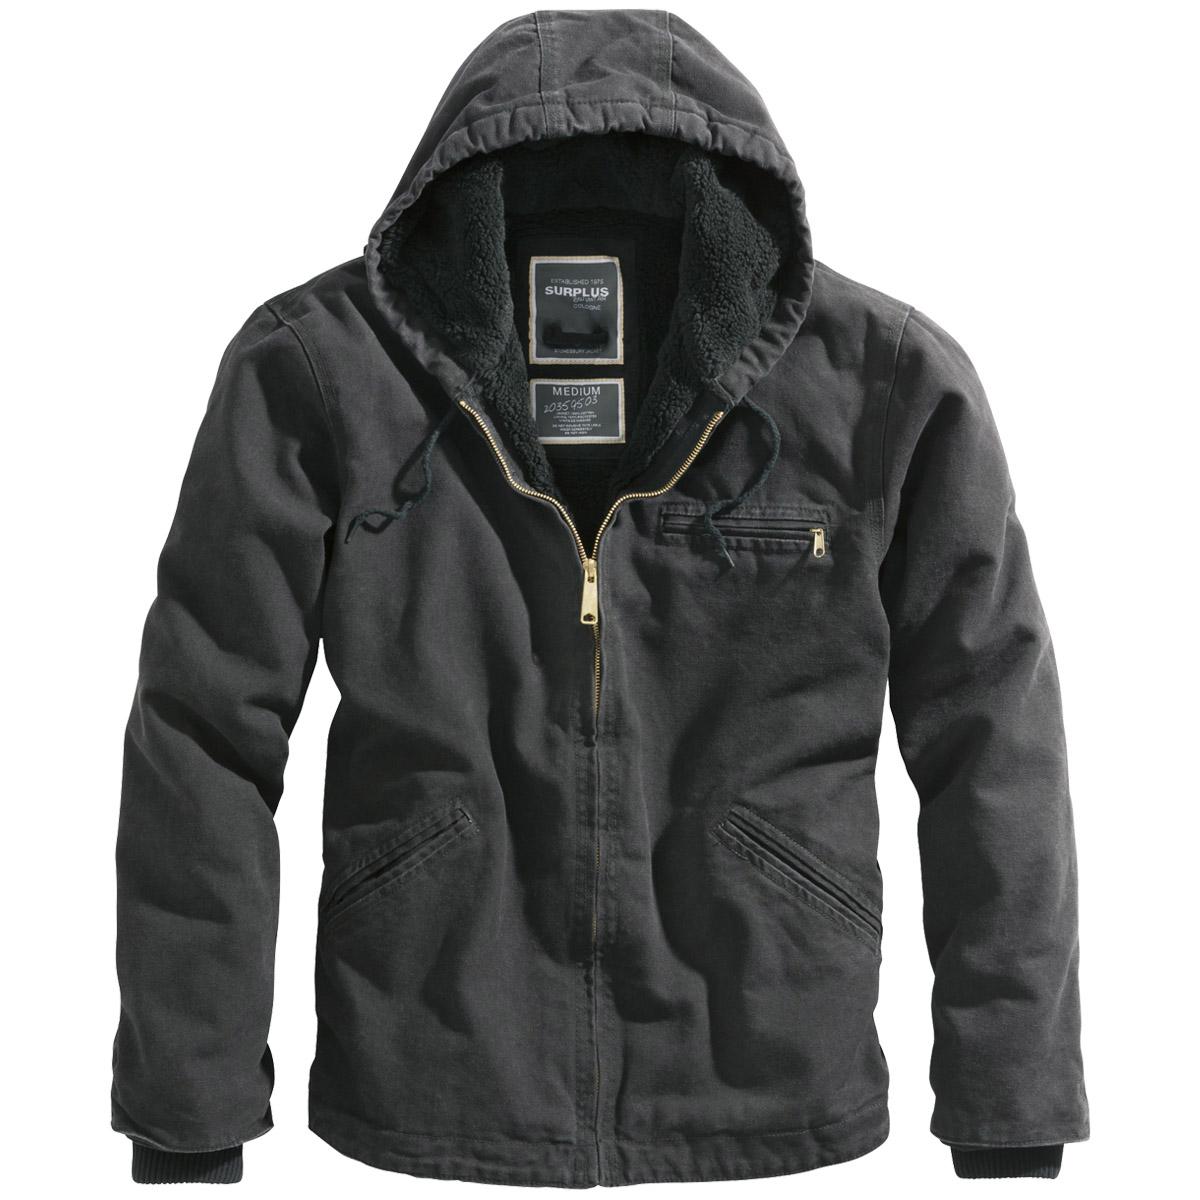 Mens jacket cotton - Surplus Stonesbury Warm Mens Cotton Jacket Hooded Vintage